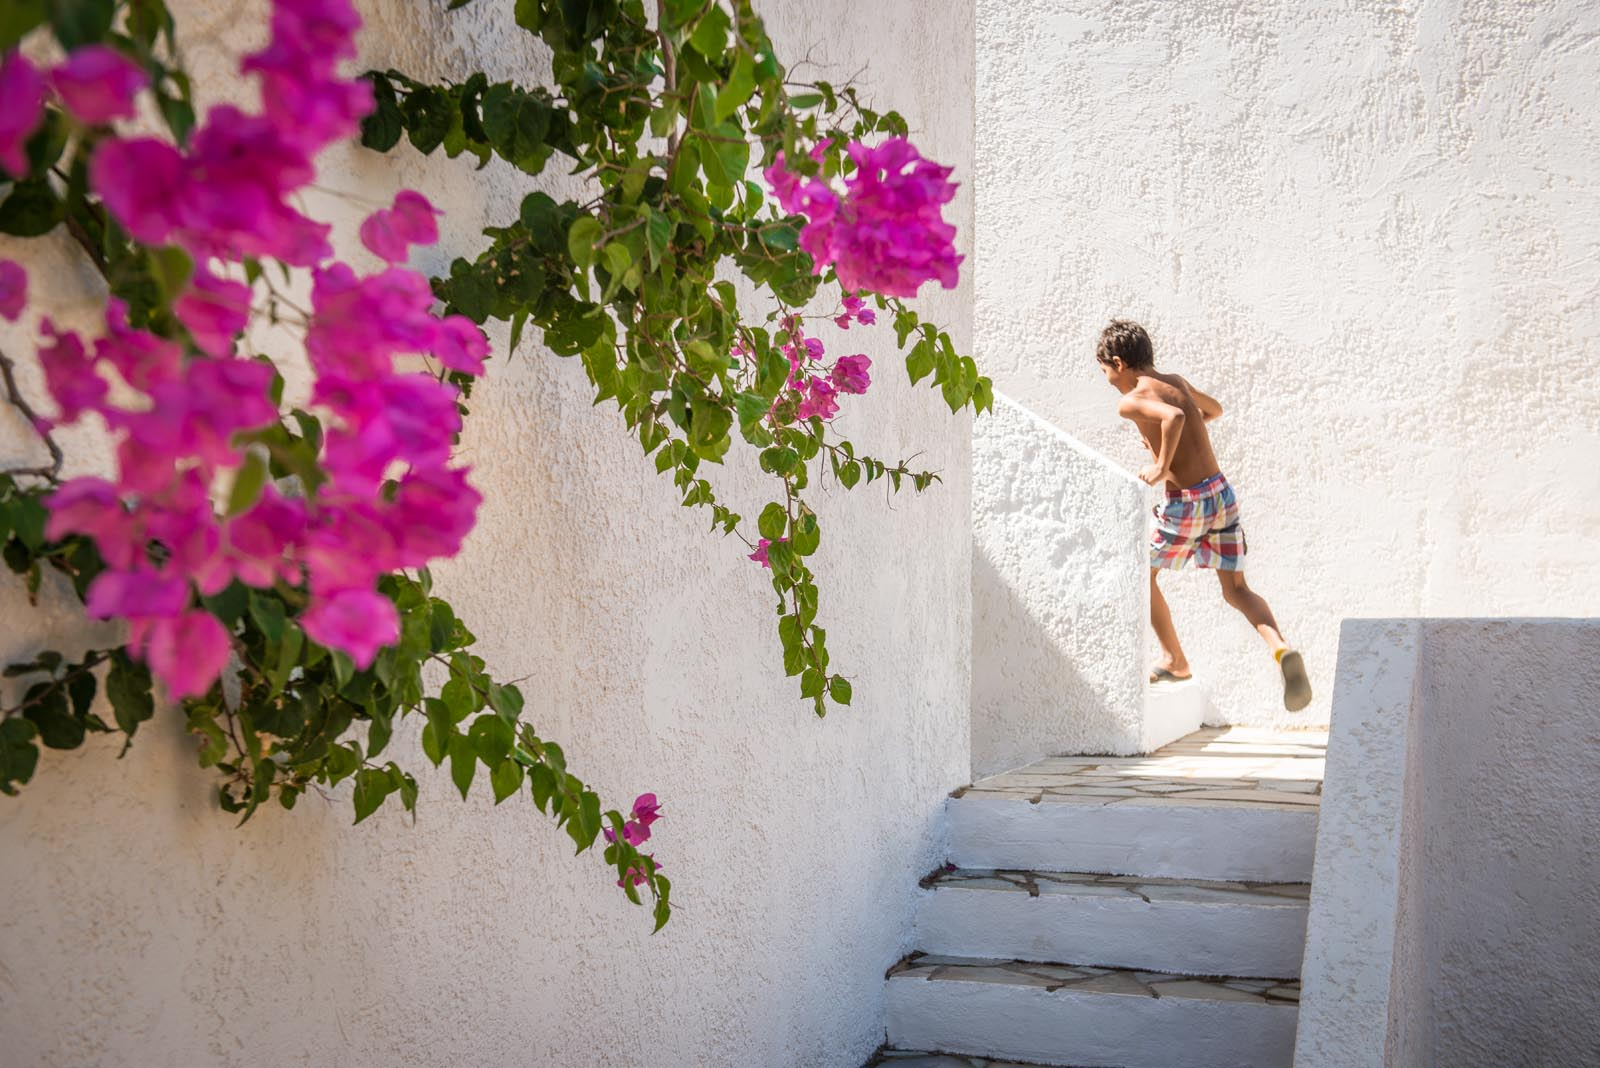 ambelos apartments and studios agia pelagia crete greece nature peacefulness cretan hospitality relaxation tranquillity holidays